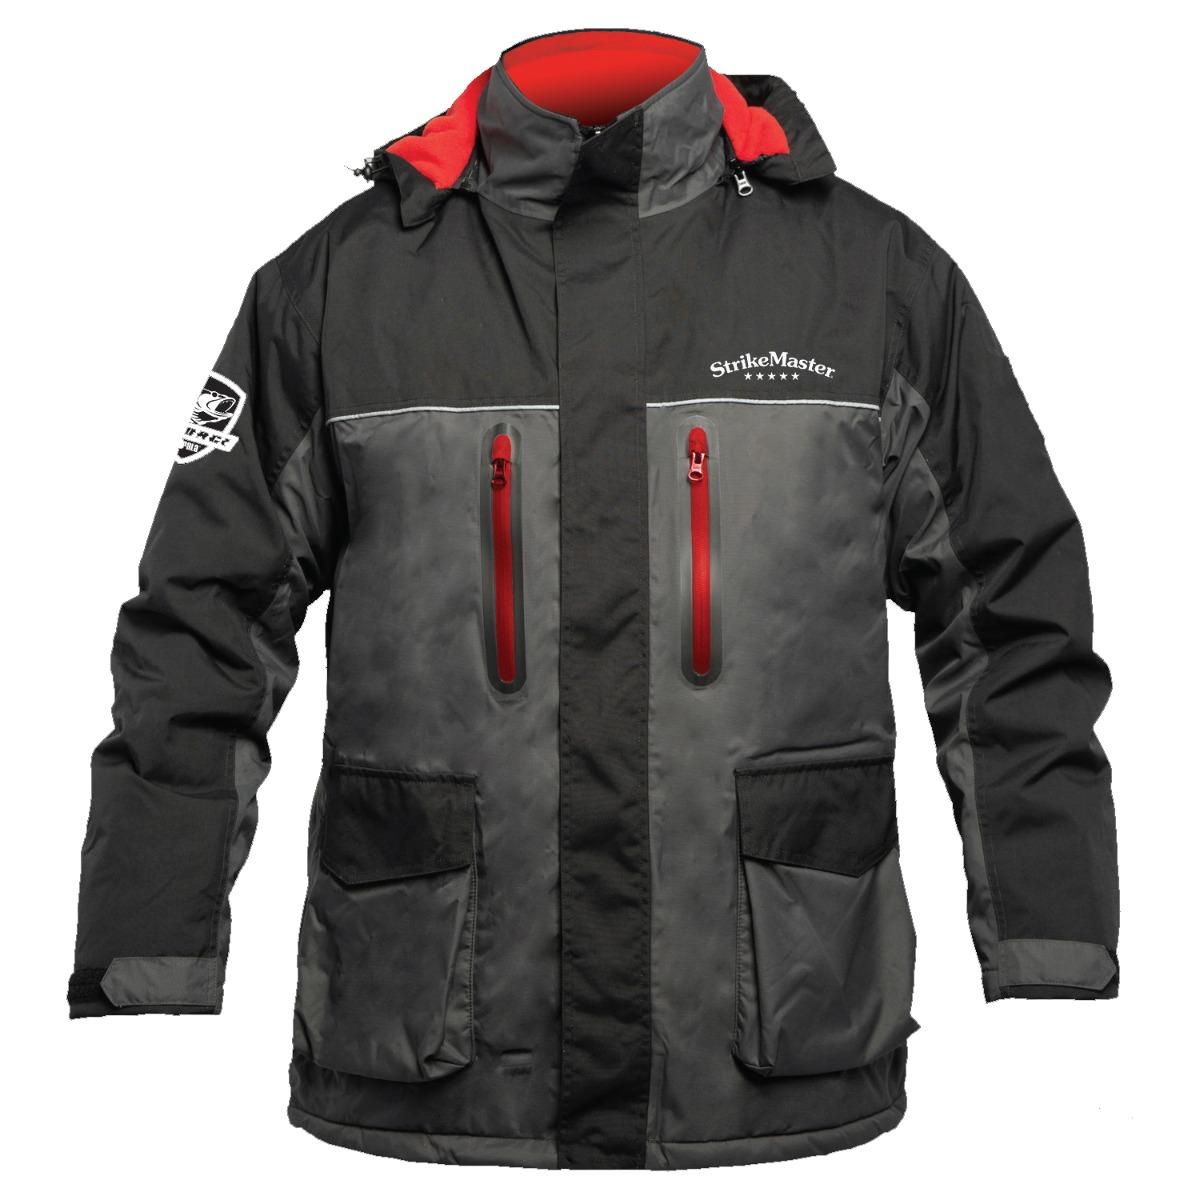 Strikemaster Surface Jacket